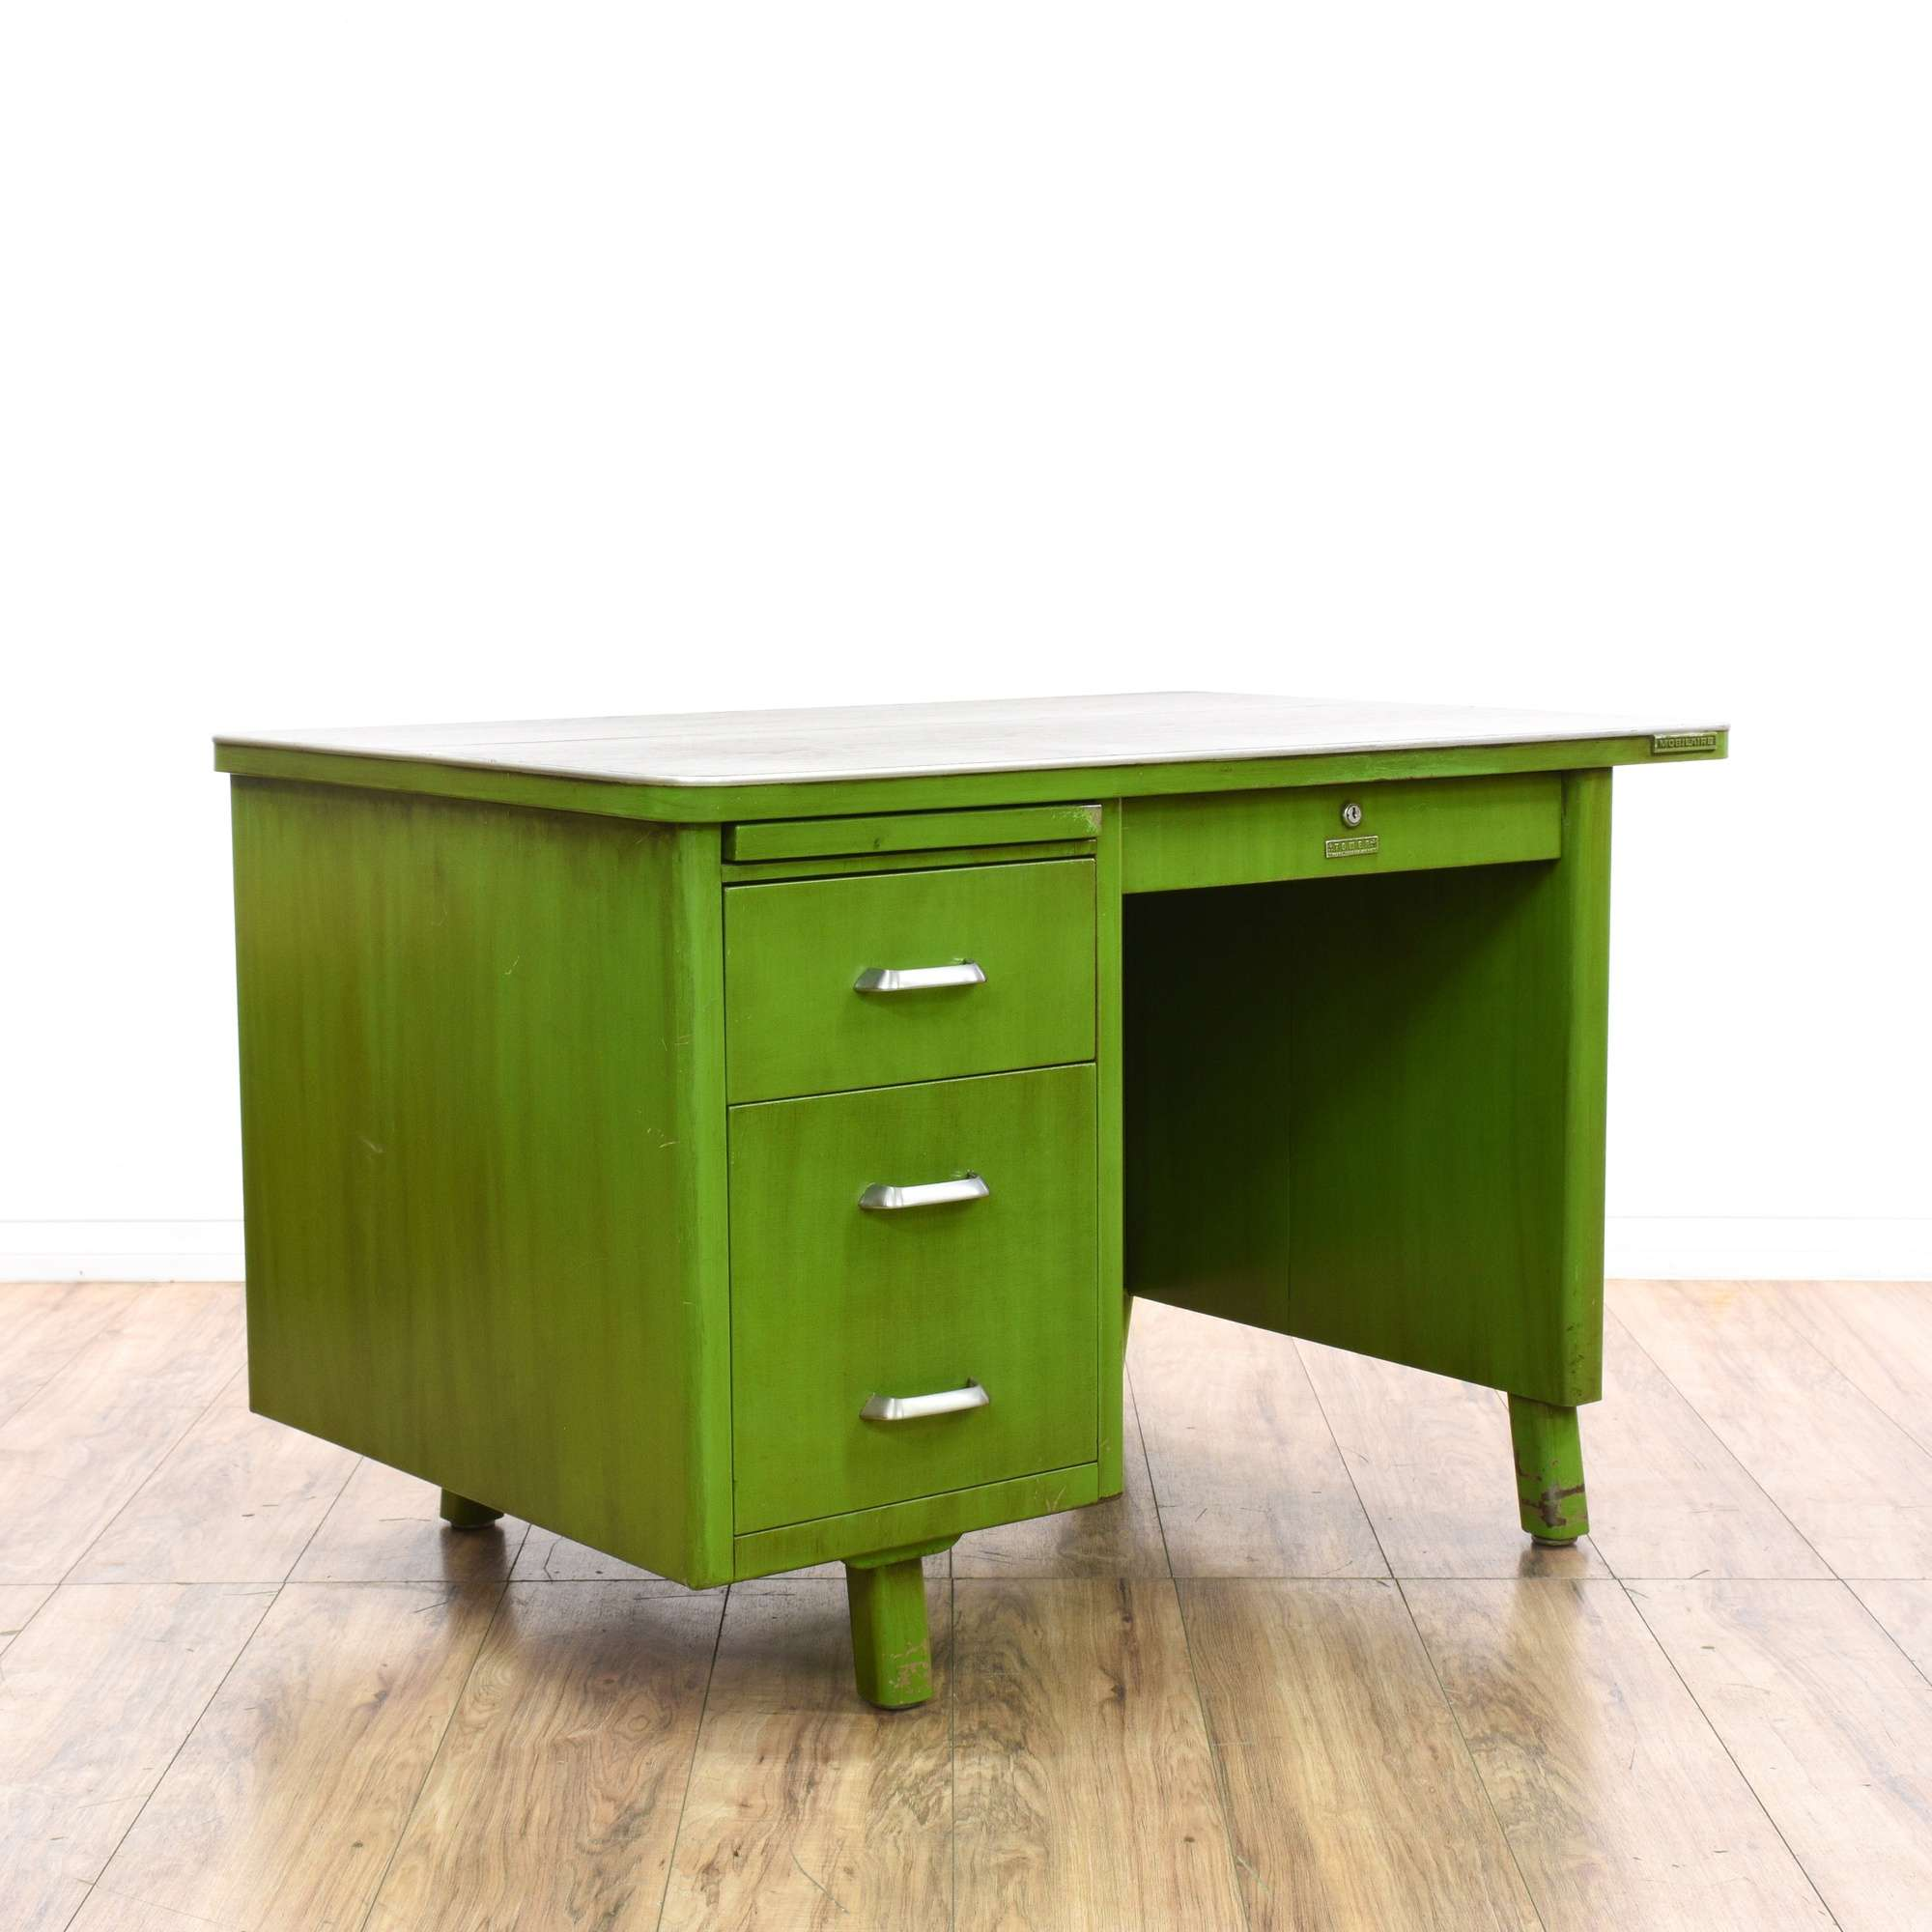 Sears Green Metal Tanker Desk Loveseat Vintage Furniture San Go